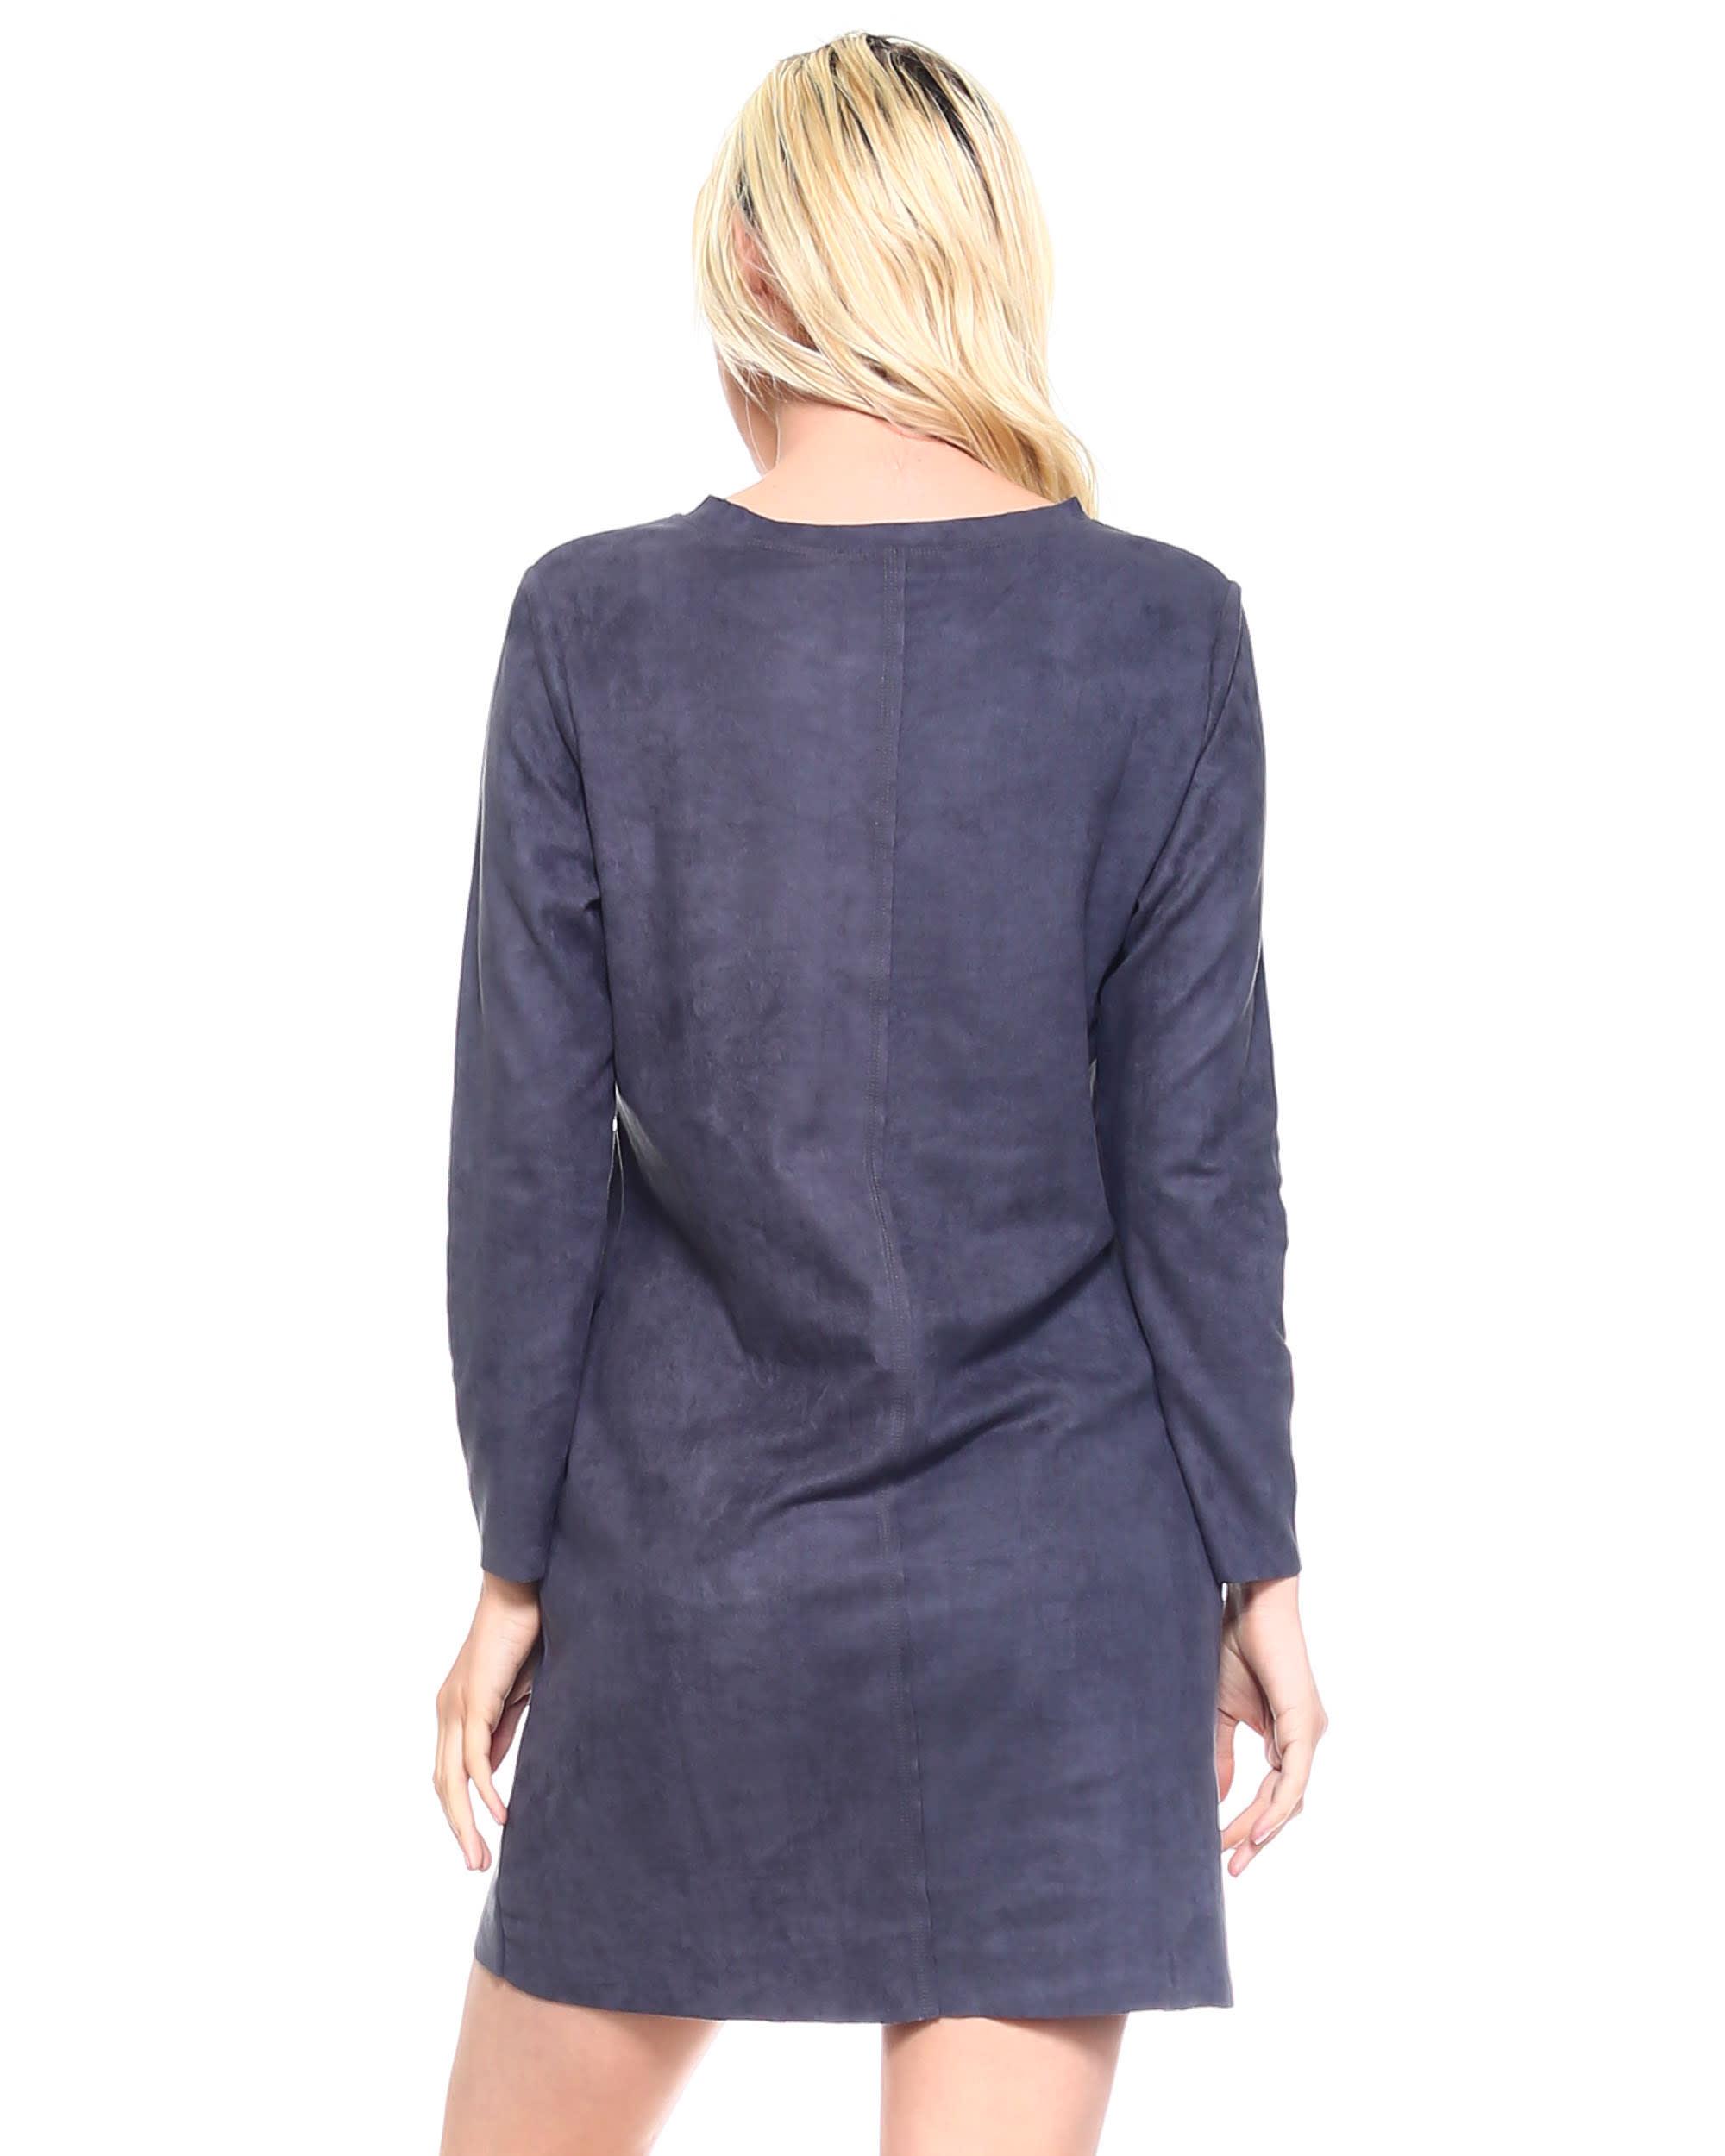 Faux Suede Aurora Dress - Charcoal - Back